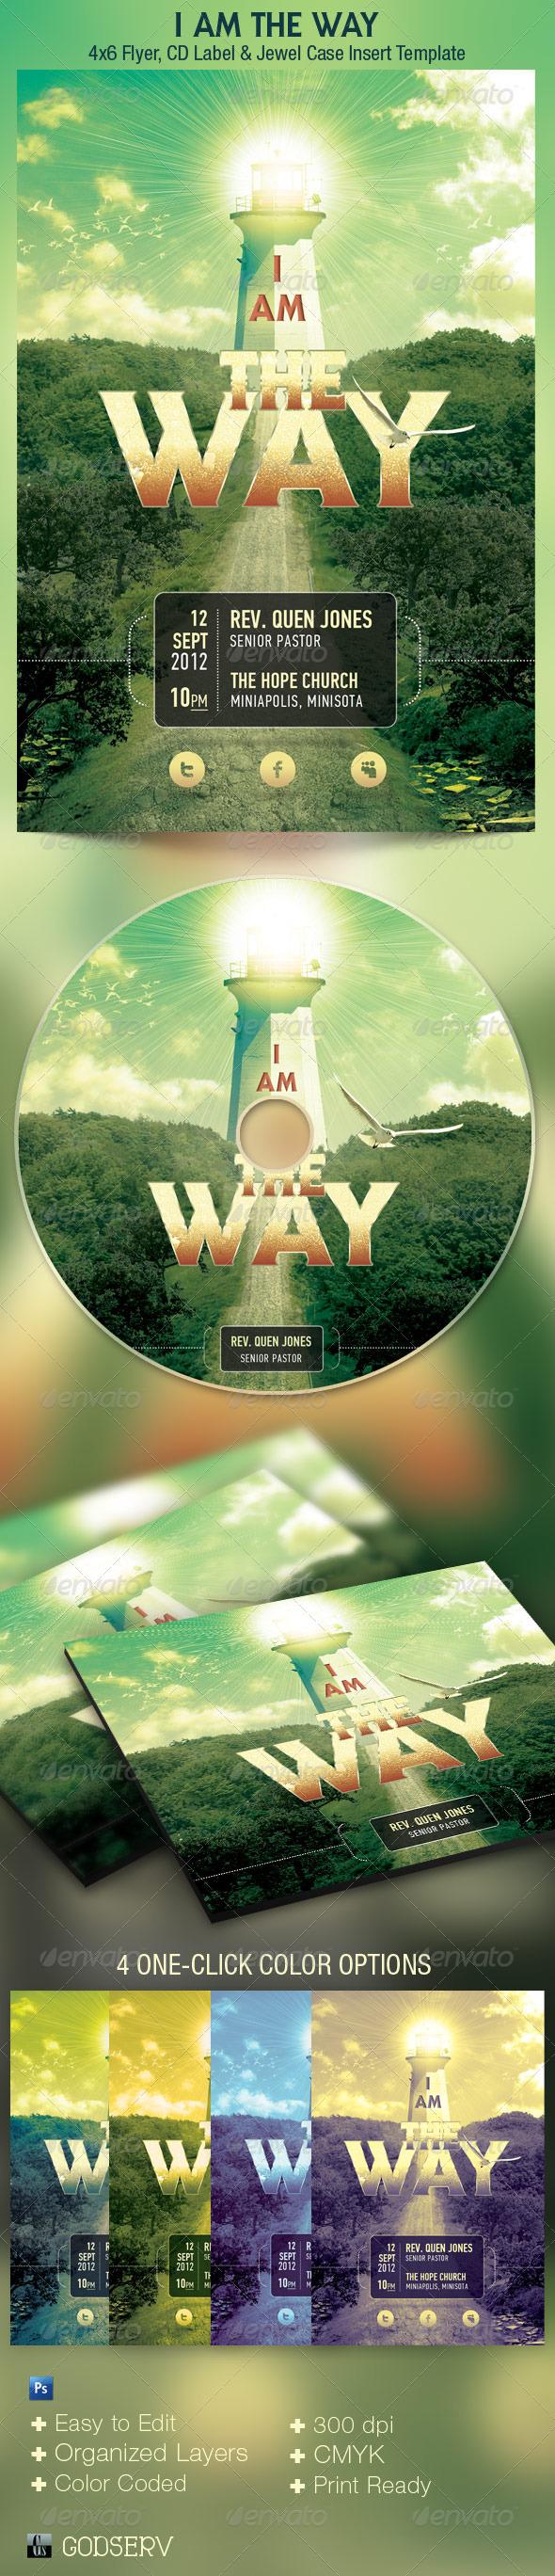 Way Church Flyer CD Template - Church Flyers